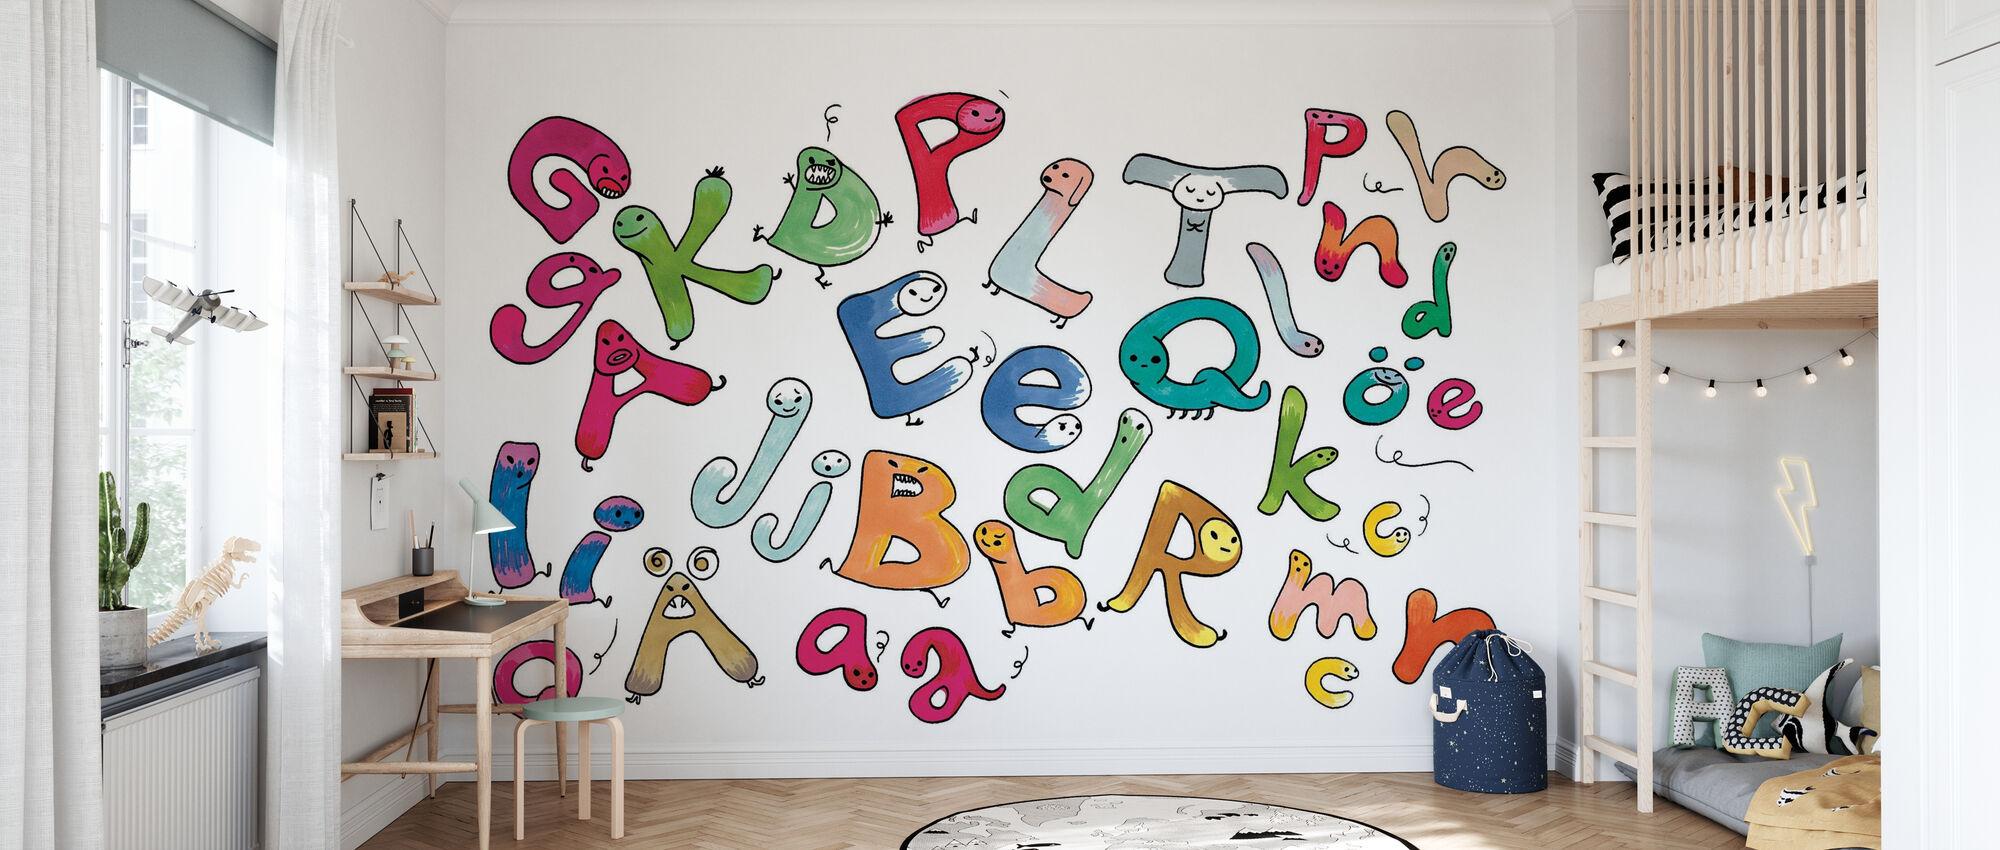 Variegated Letters - Wallpaper - Kids Room